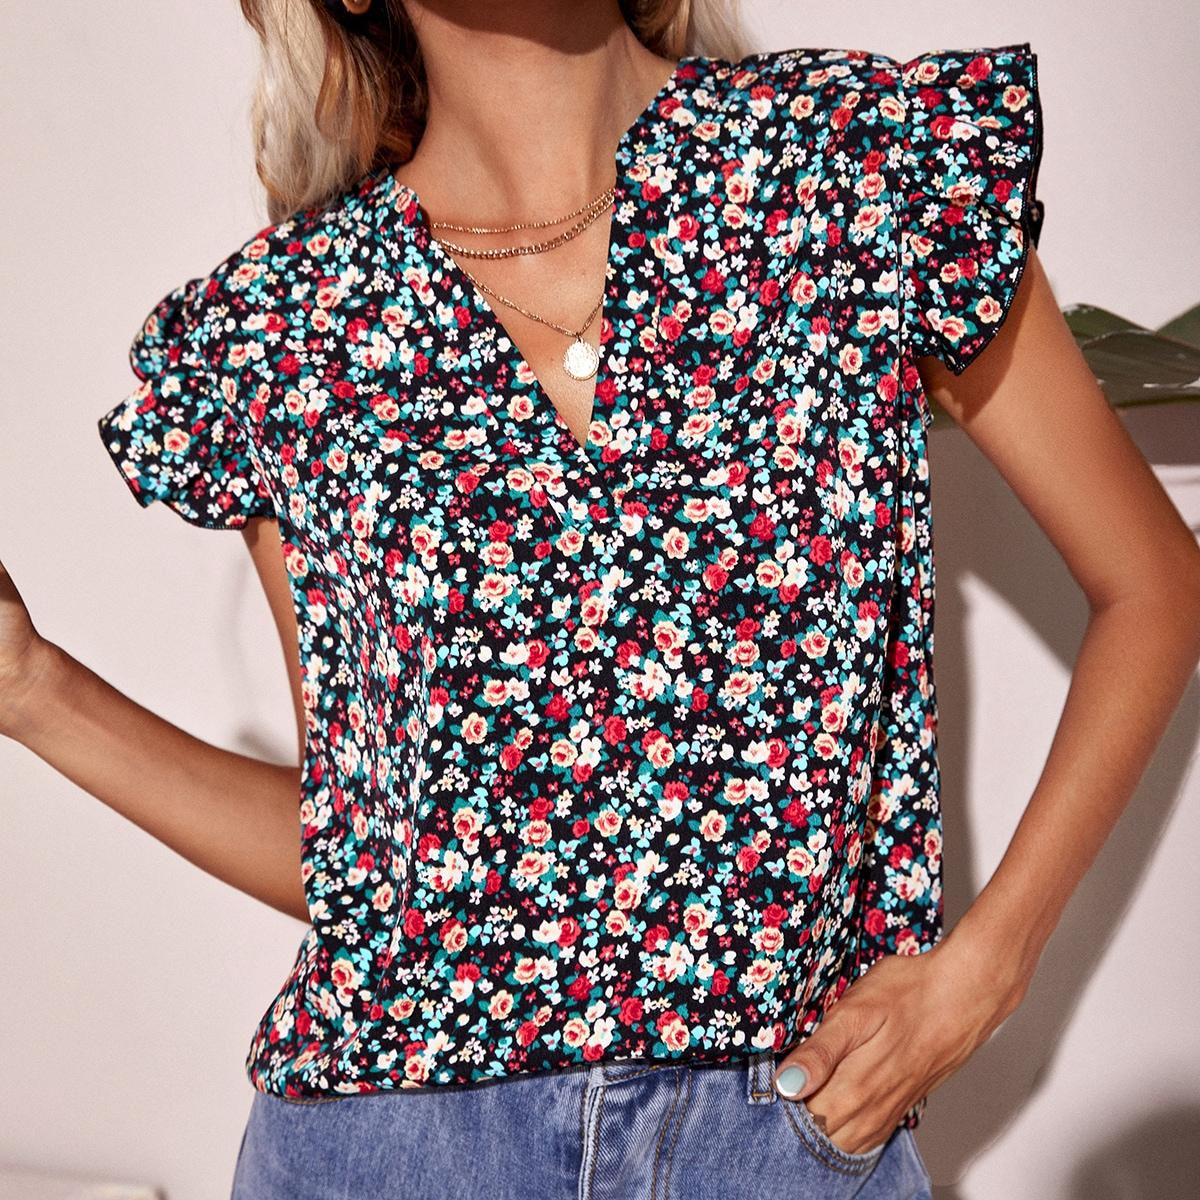 Блуза с цветочным принтом SheIn swblouse23210517930